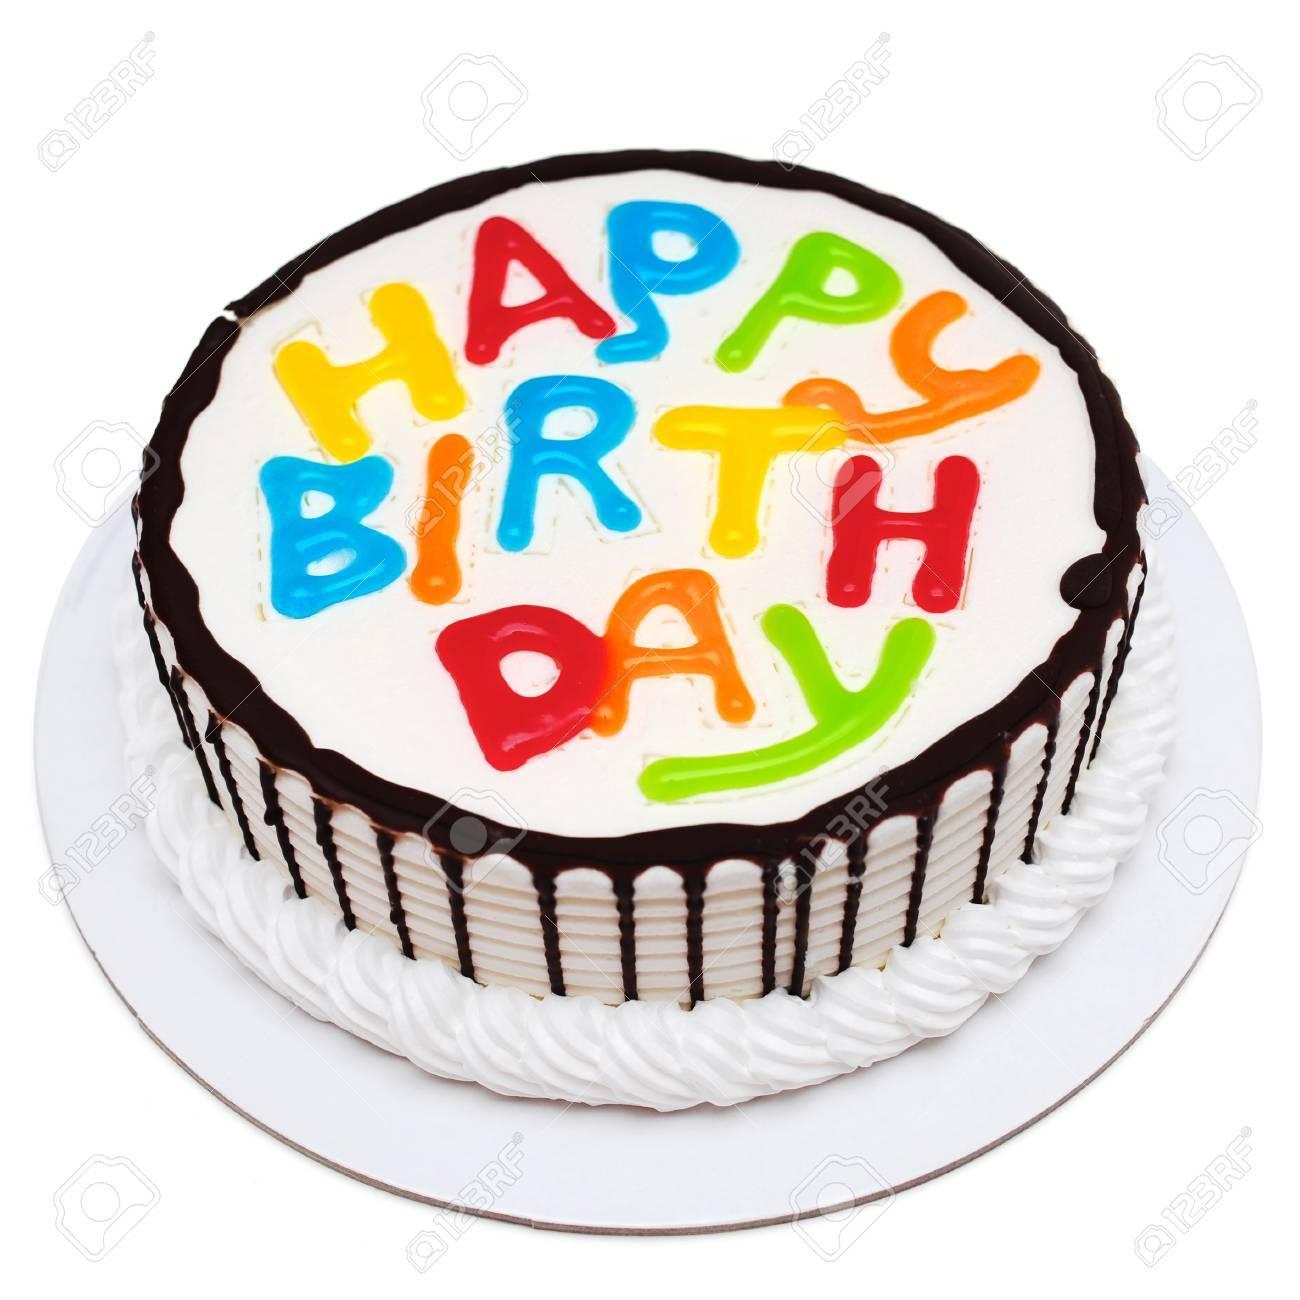 Birthday cake - 15735429